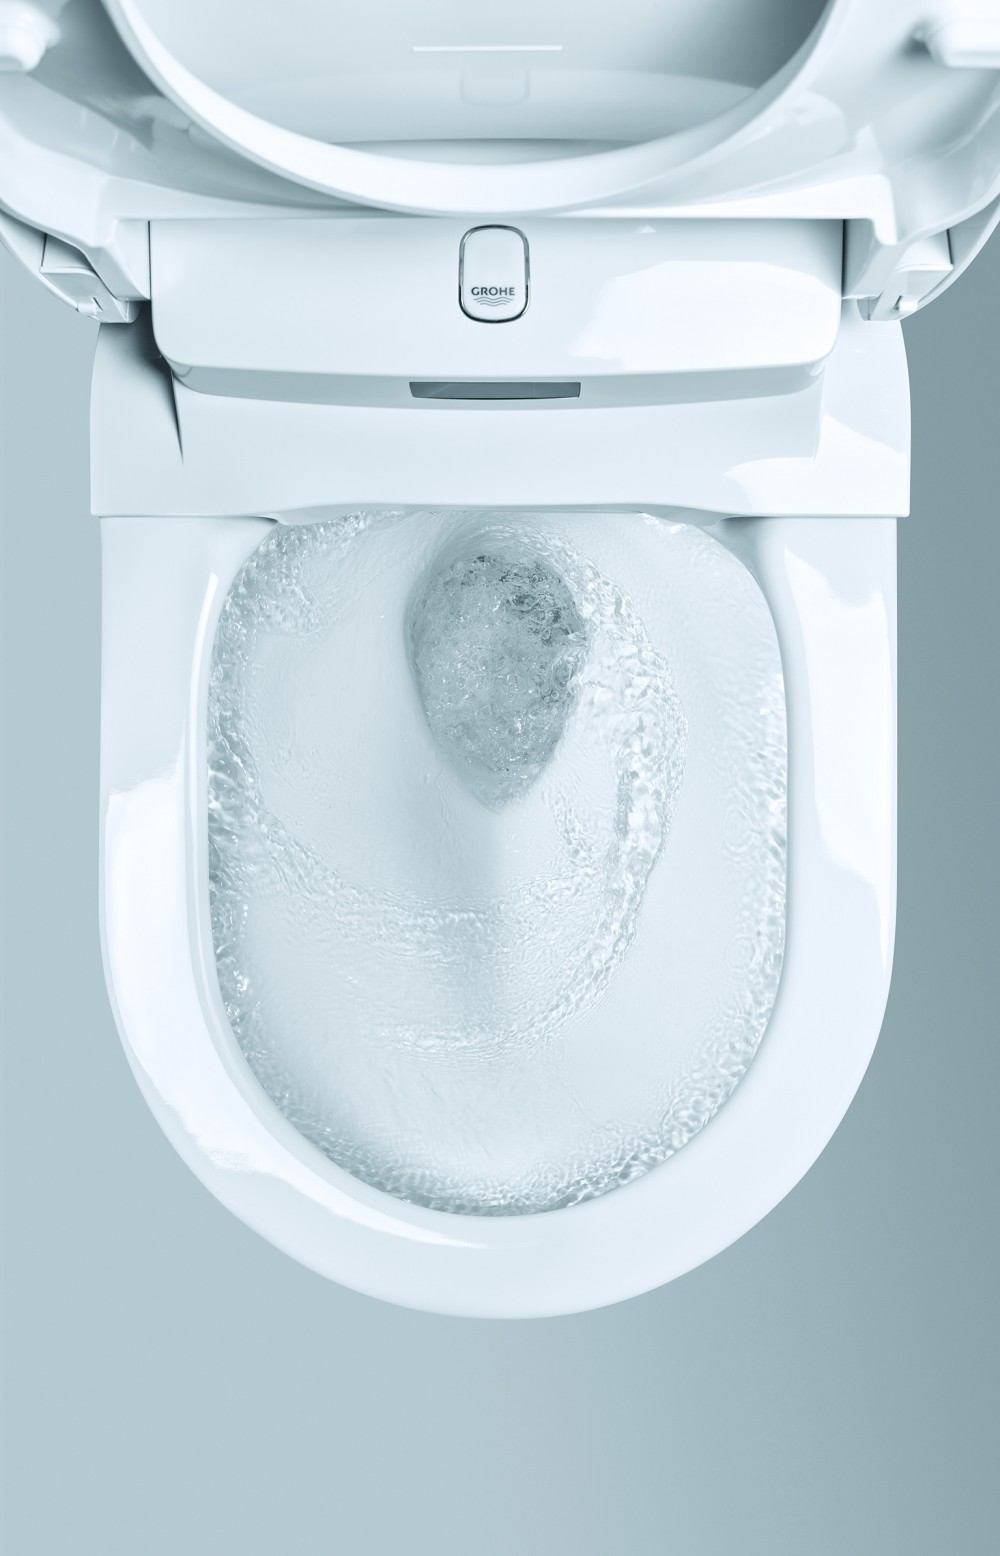 grohe sensia areana spalet shower toilet bidet seat rimless design